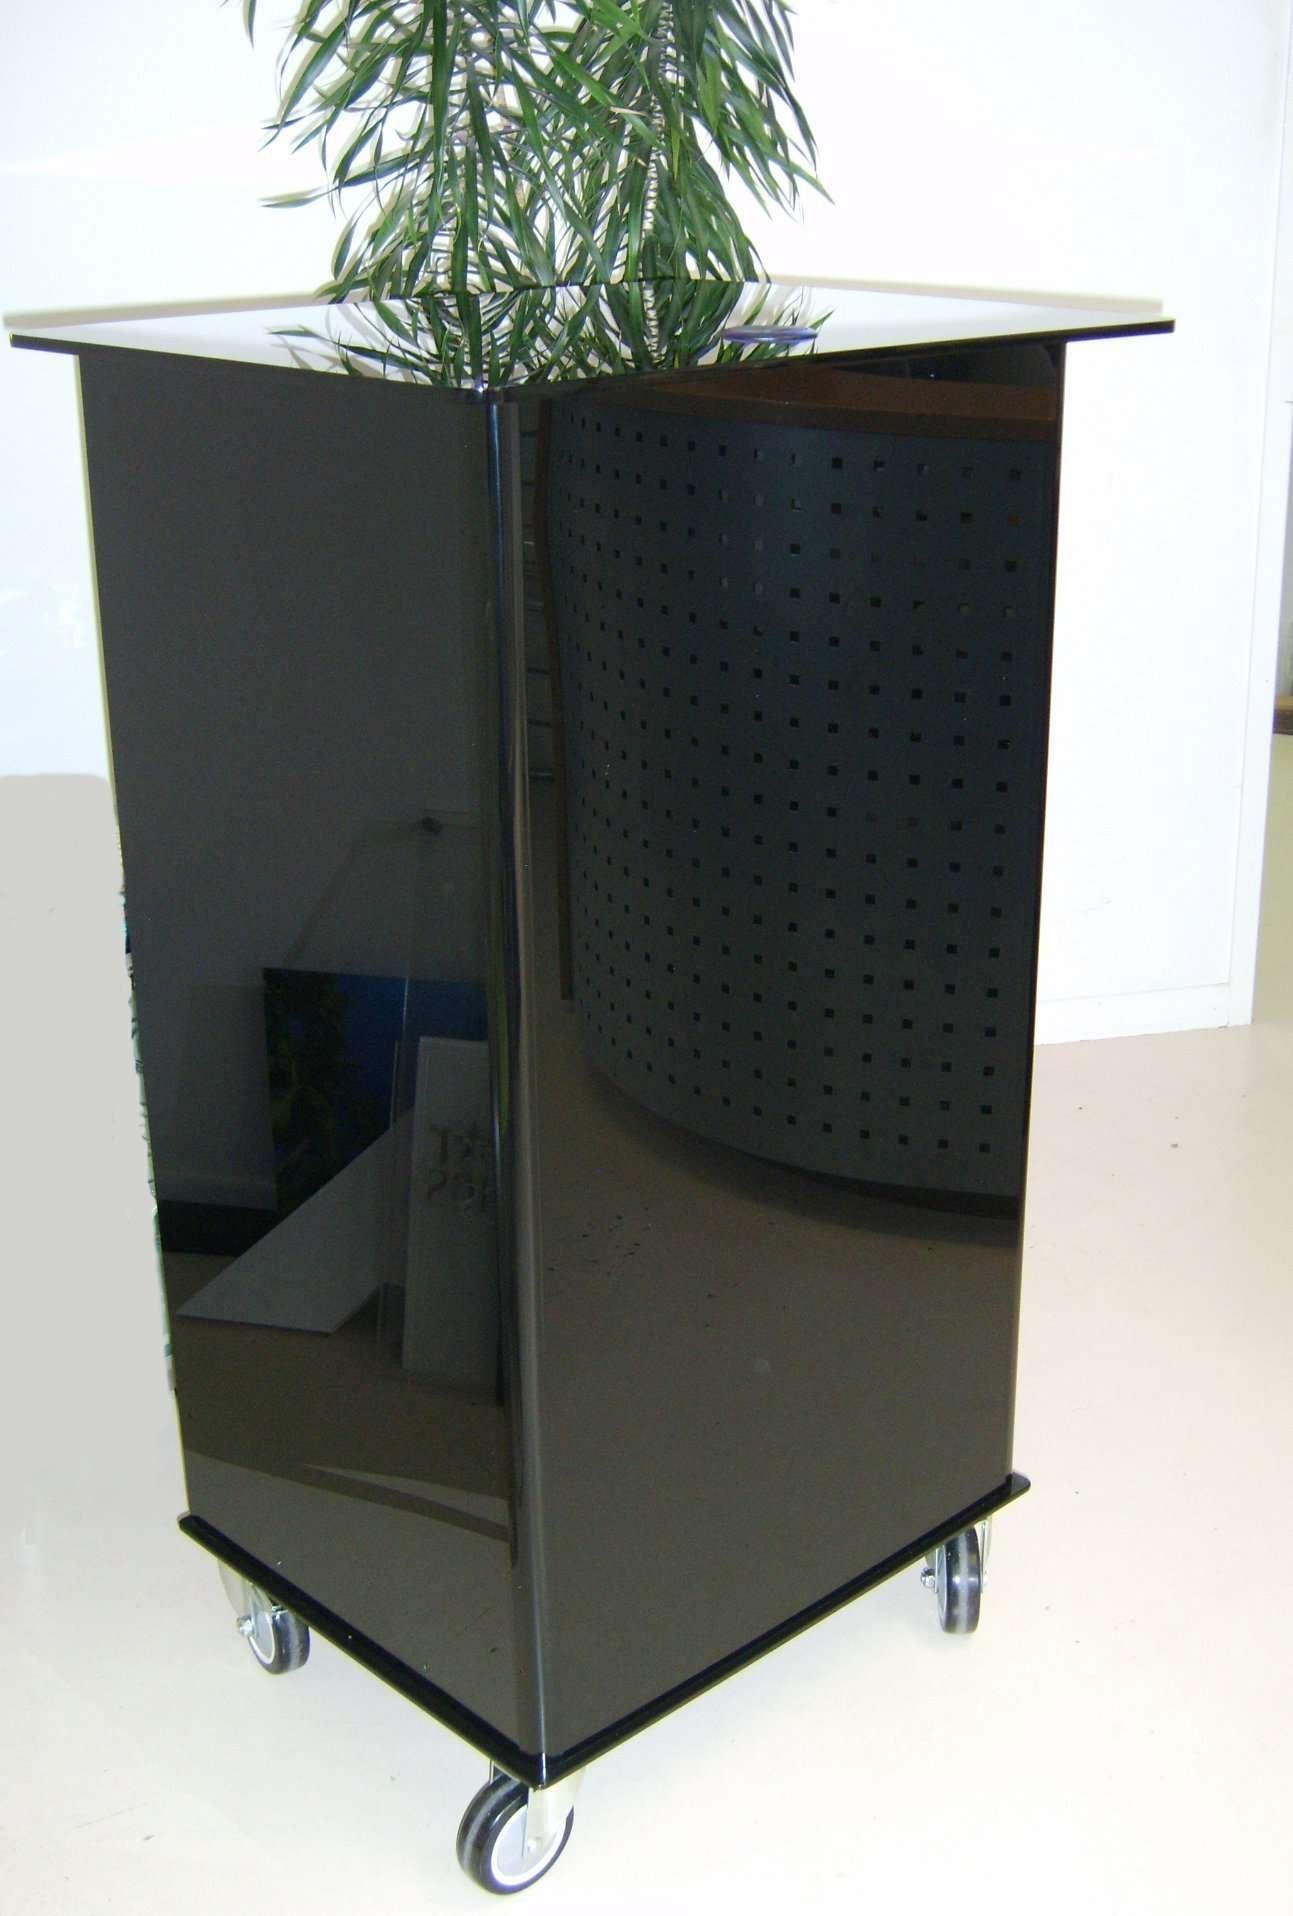 Black Acrylic lectern on wheels